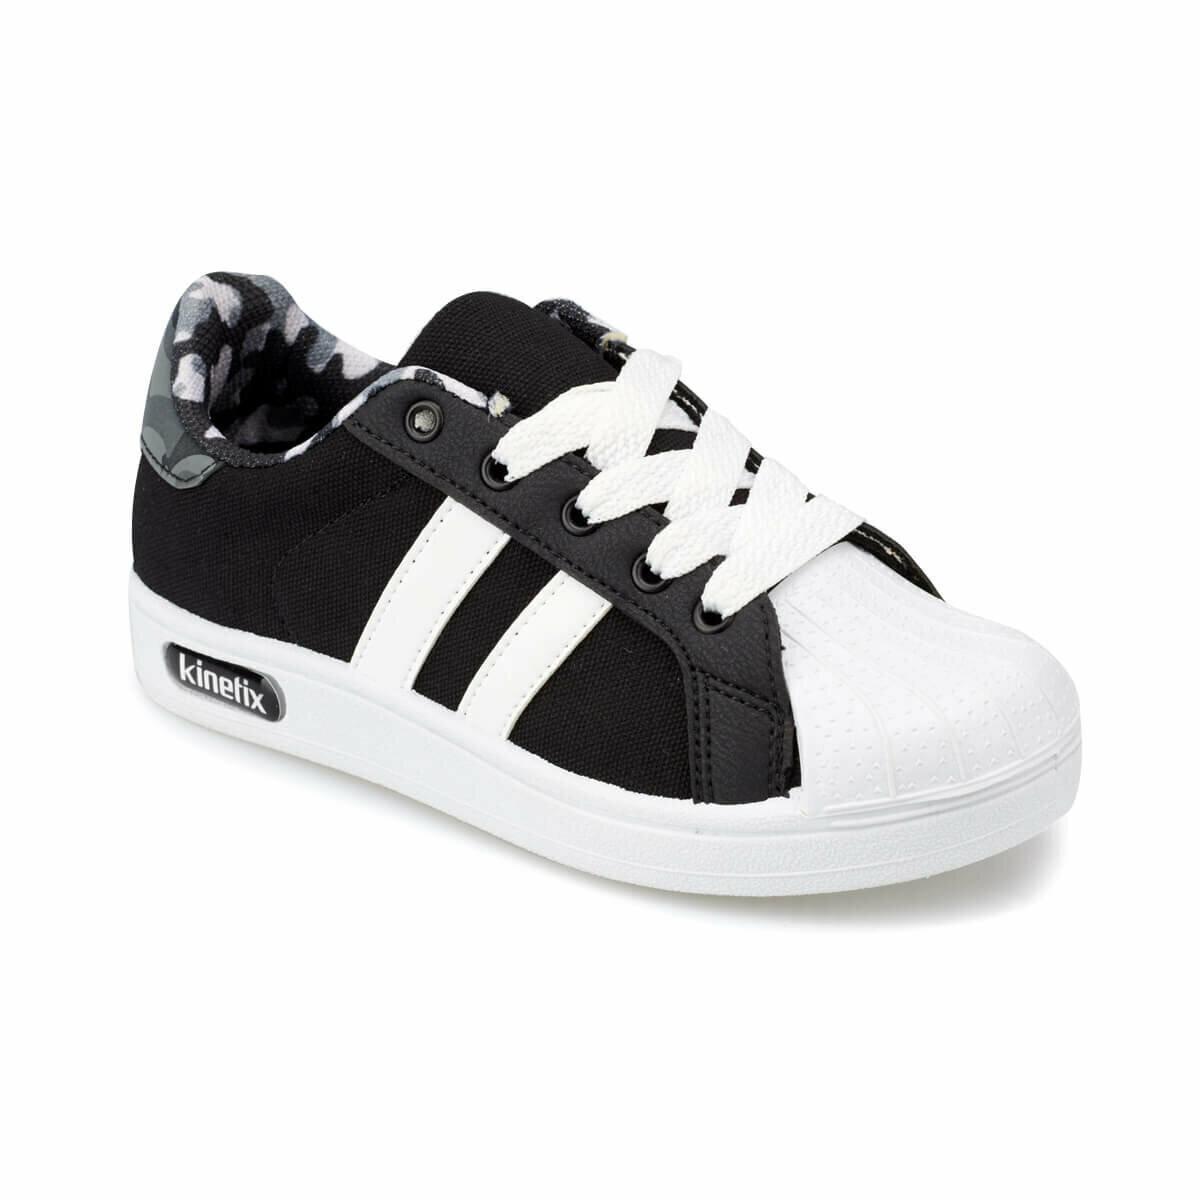 FLO RENDRO X Black Male Child Sneaker Shoes KINETIX